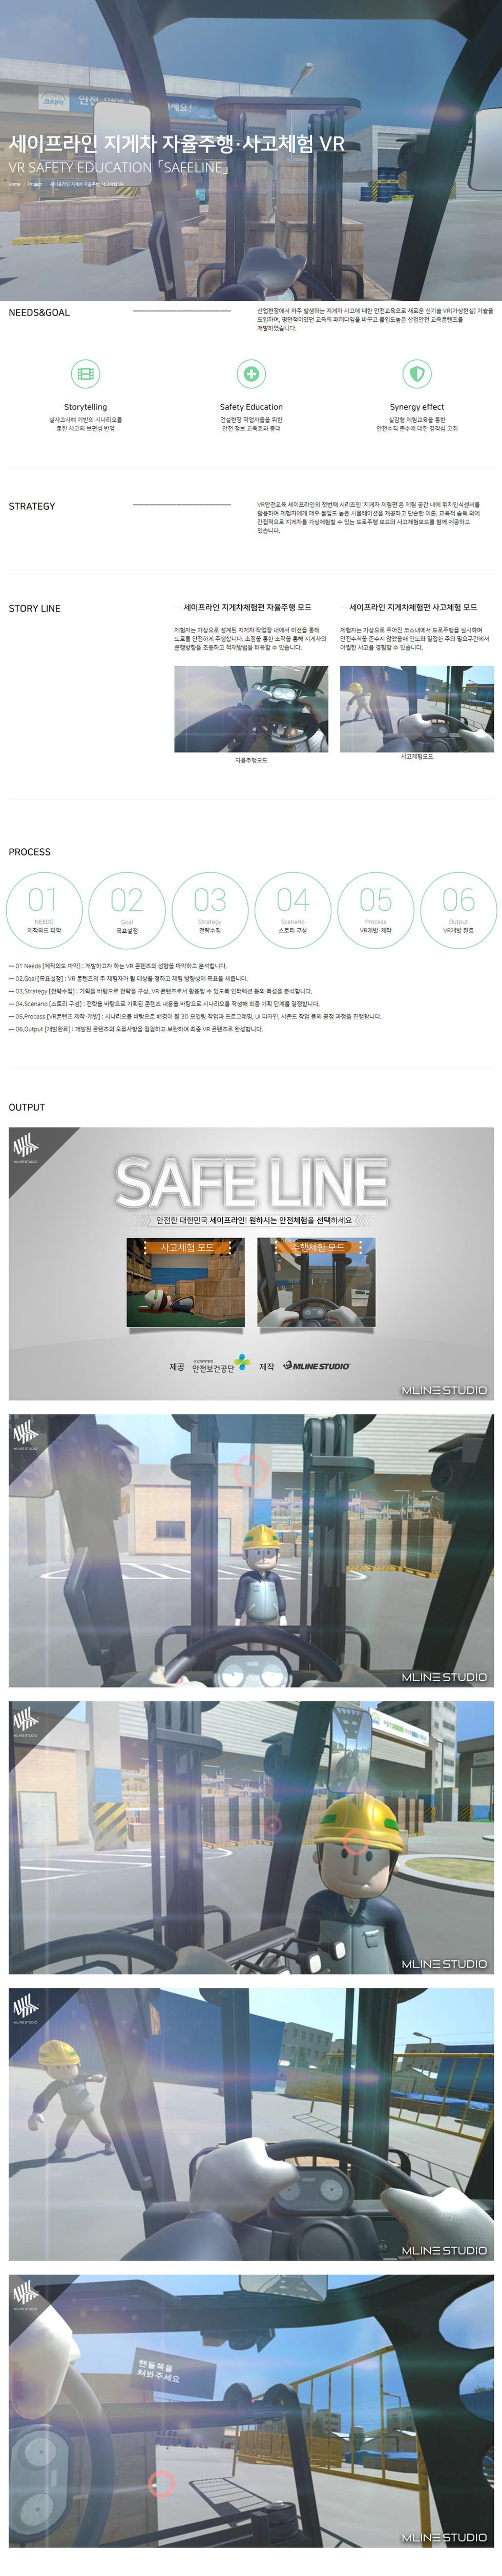 screencapture-m-line-tv-project-20170701